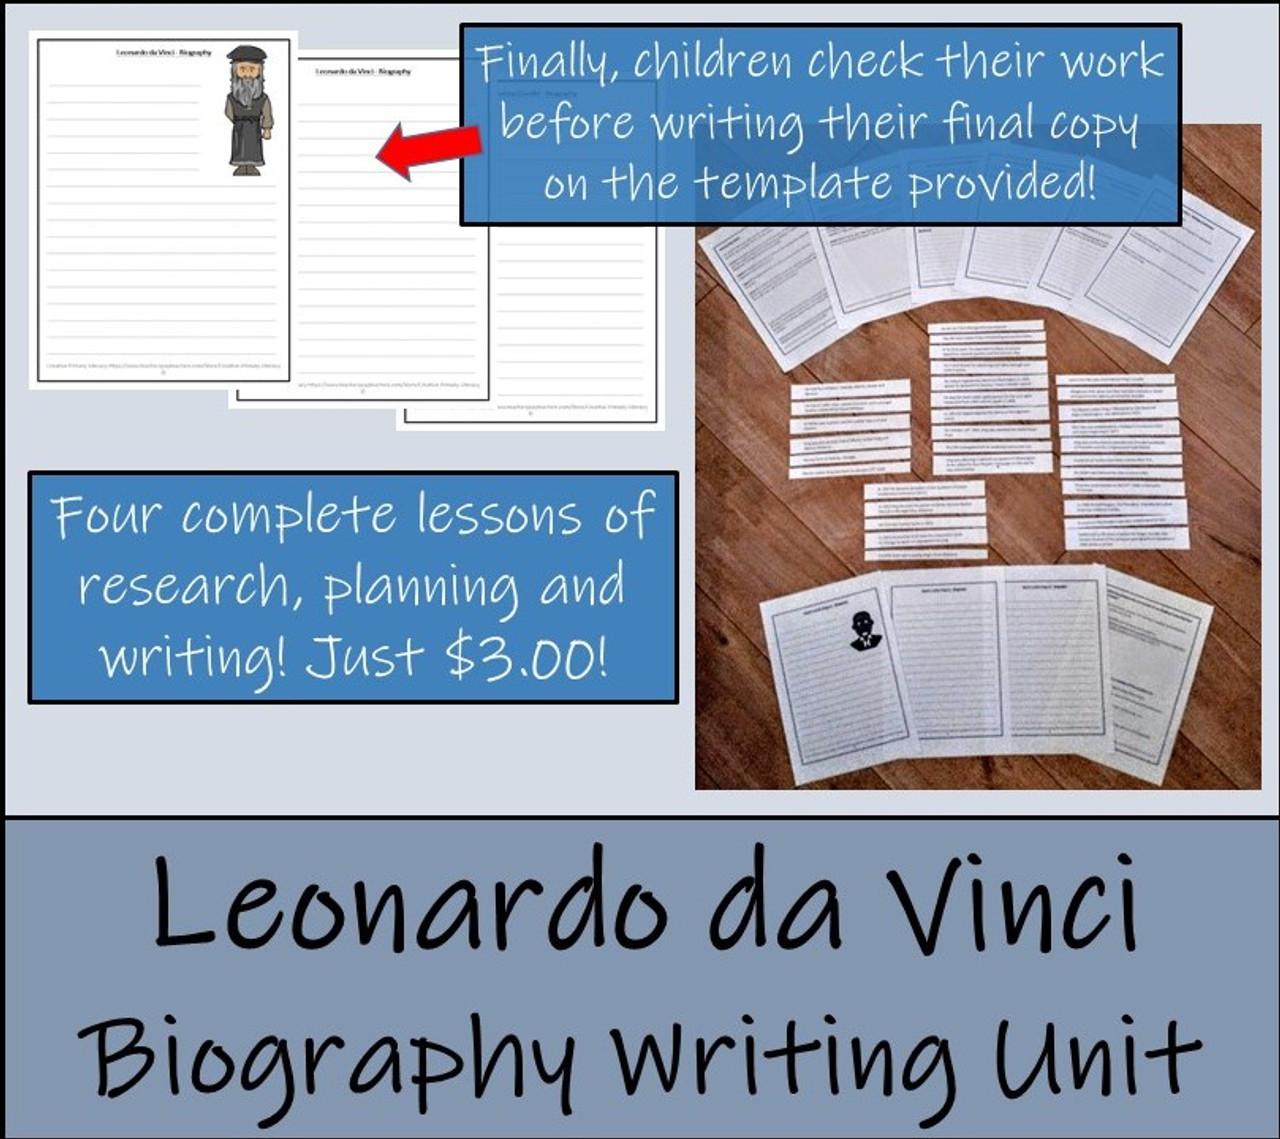 Leonardo da Vinci - 5th & 6th Grade Biography Writing Activity